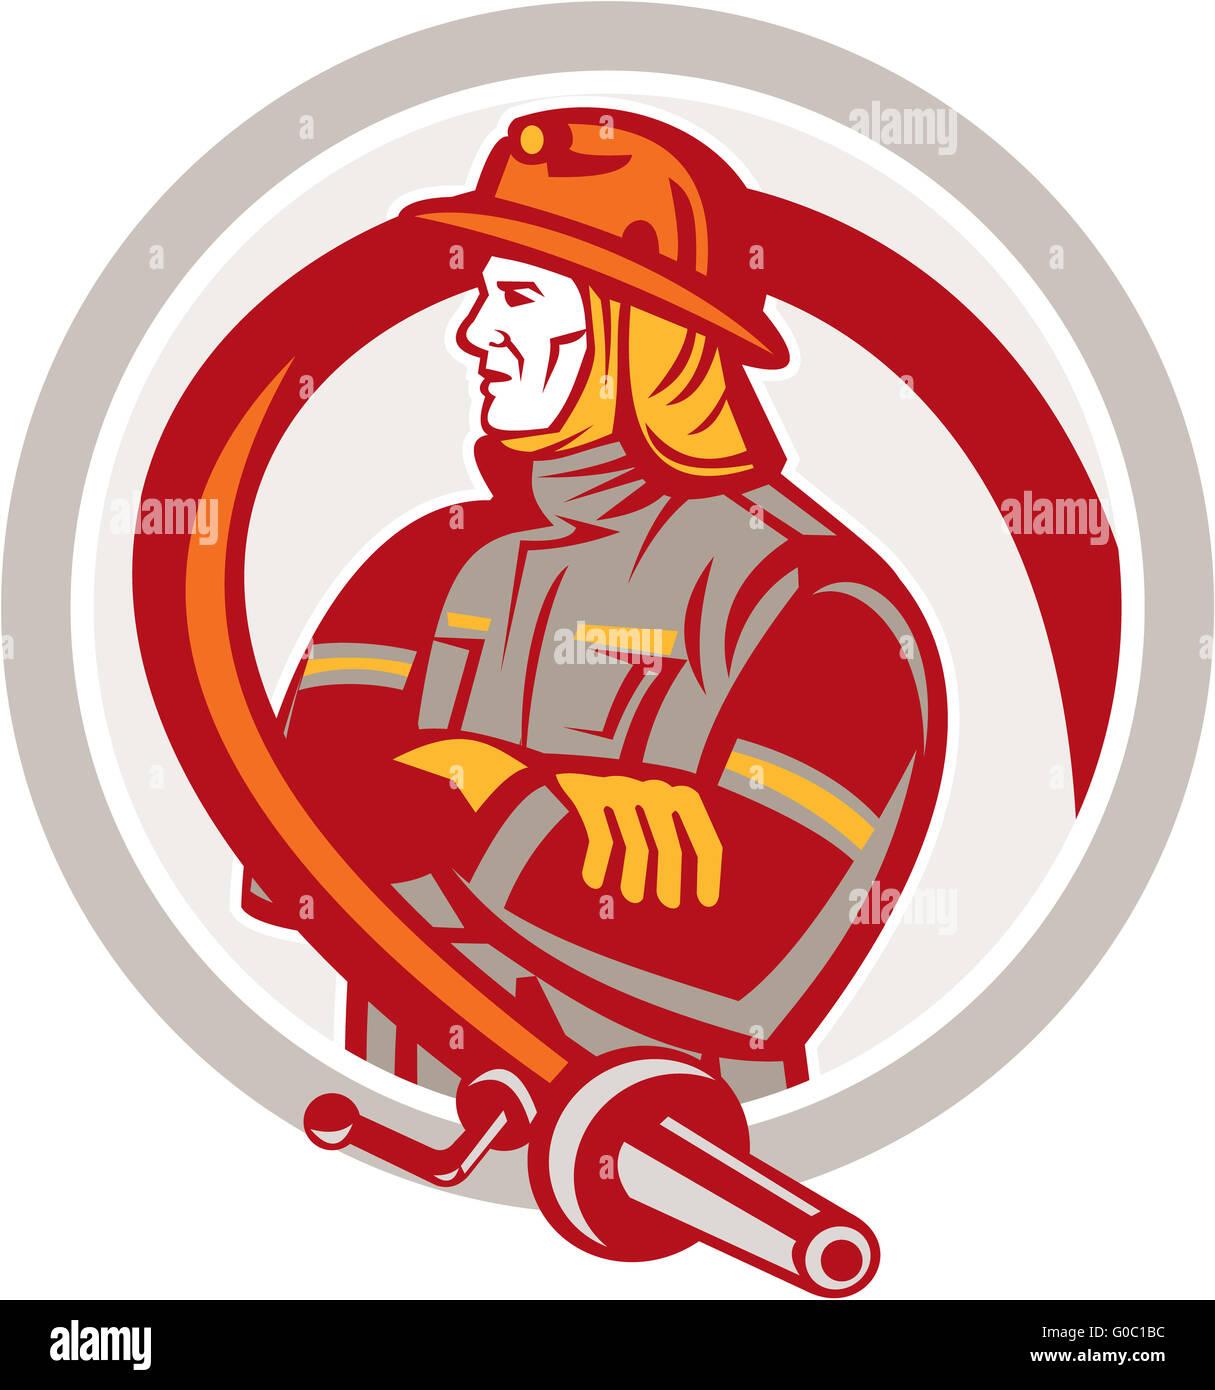 Feuerwehrmann Feuerwehrmann stehend Faltung Arme Kreis Stockbild